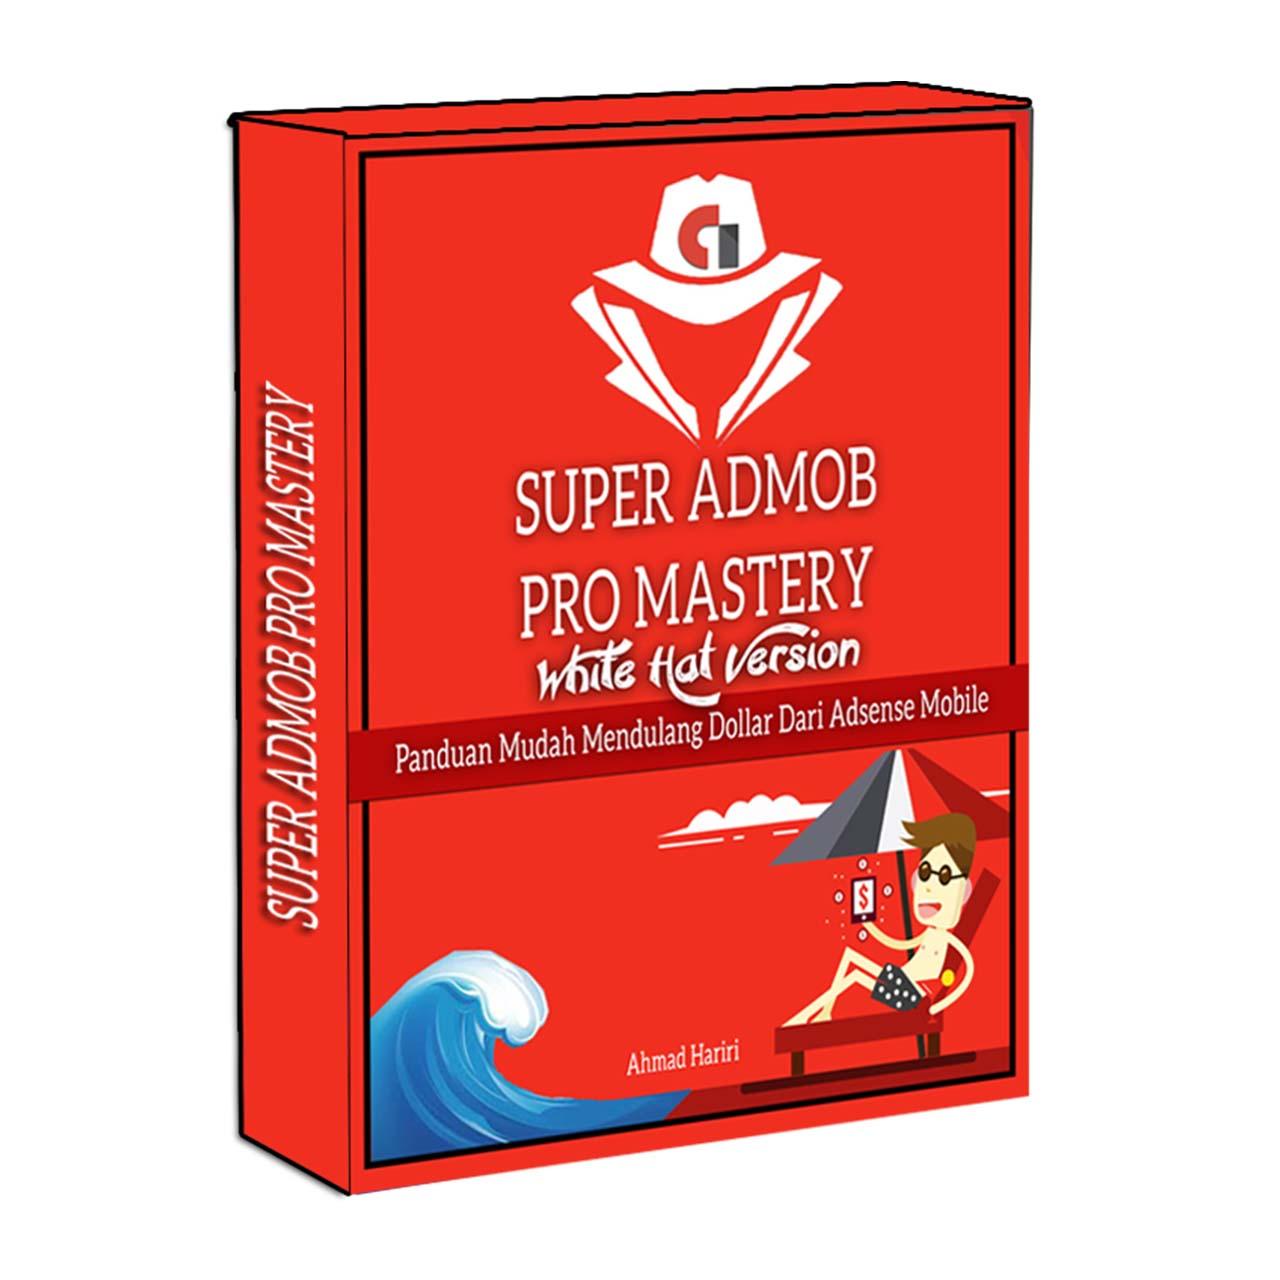 Super Admob Pro Mastery White Hat Version